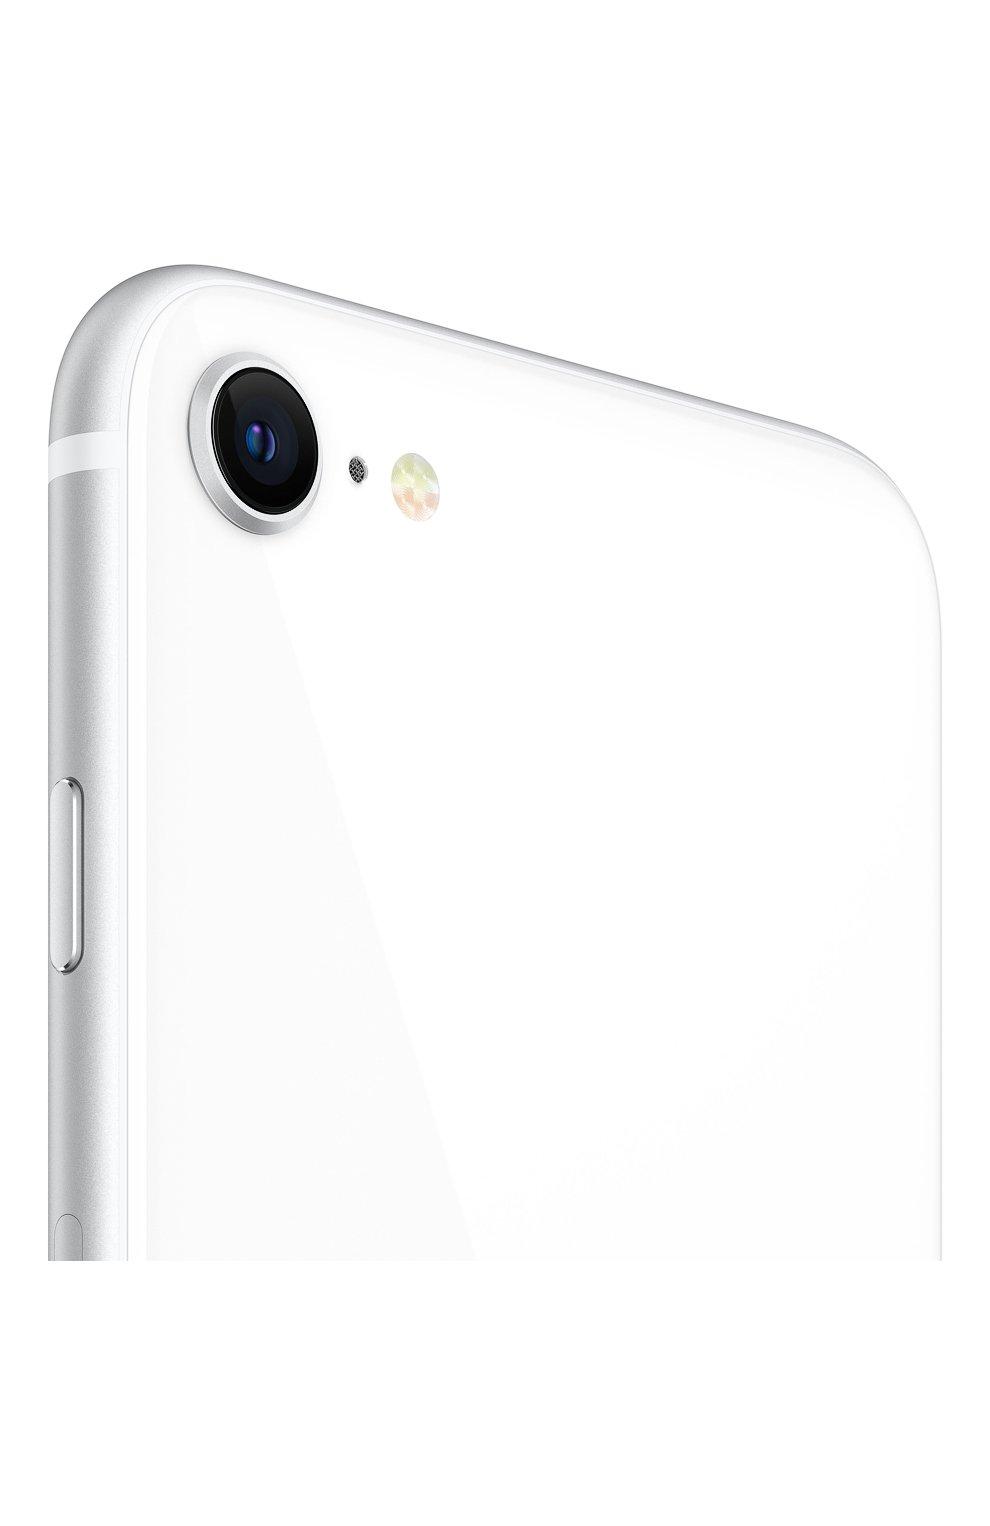 Мужской iphone se (2020) 128gb white APPLE  white цвета, арт. MXD12RU/A | Фото 4